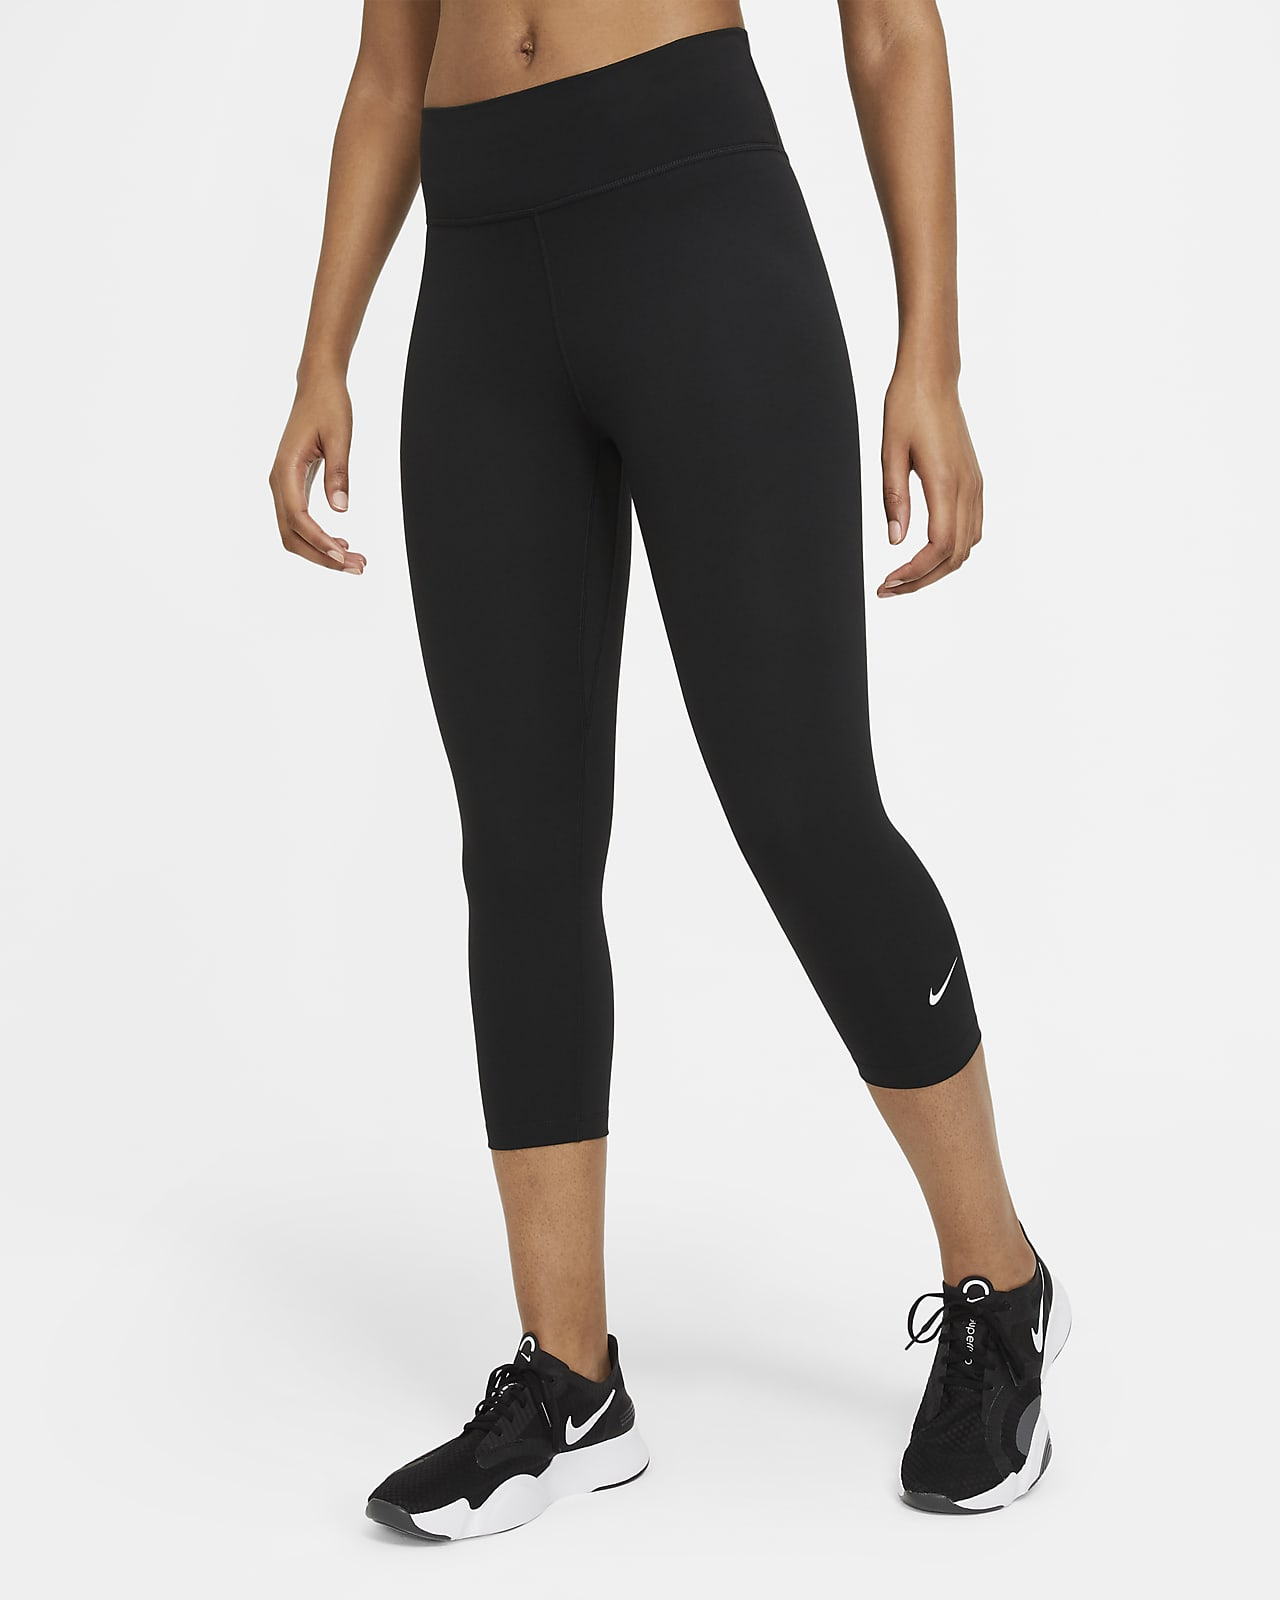 Leggings Nike One Capri för kvinnor